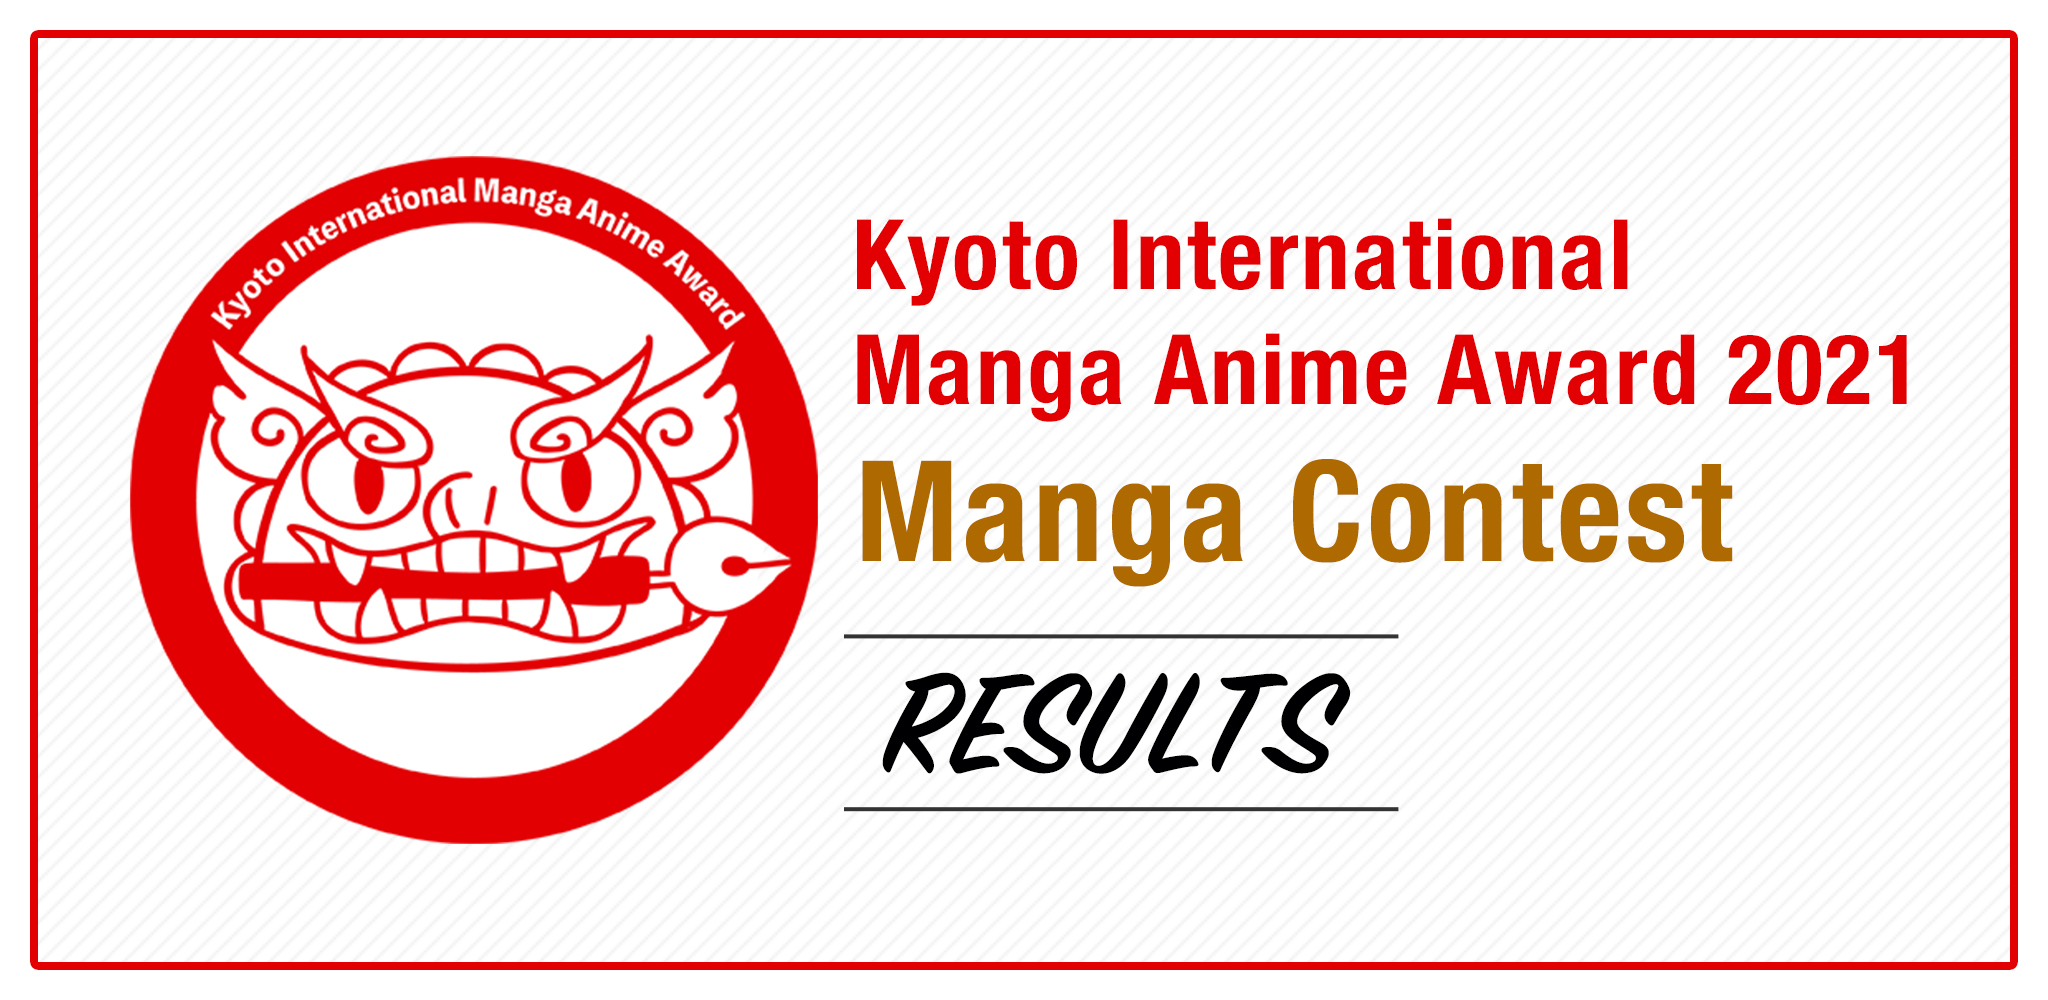 Kyoto International Manga Anime Award 2021 Manga Contest| Contest - ART street by MediBang